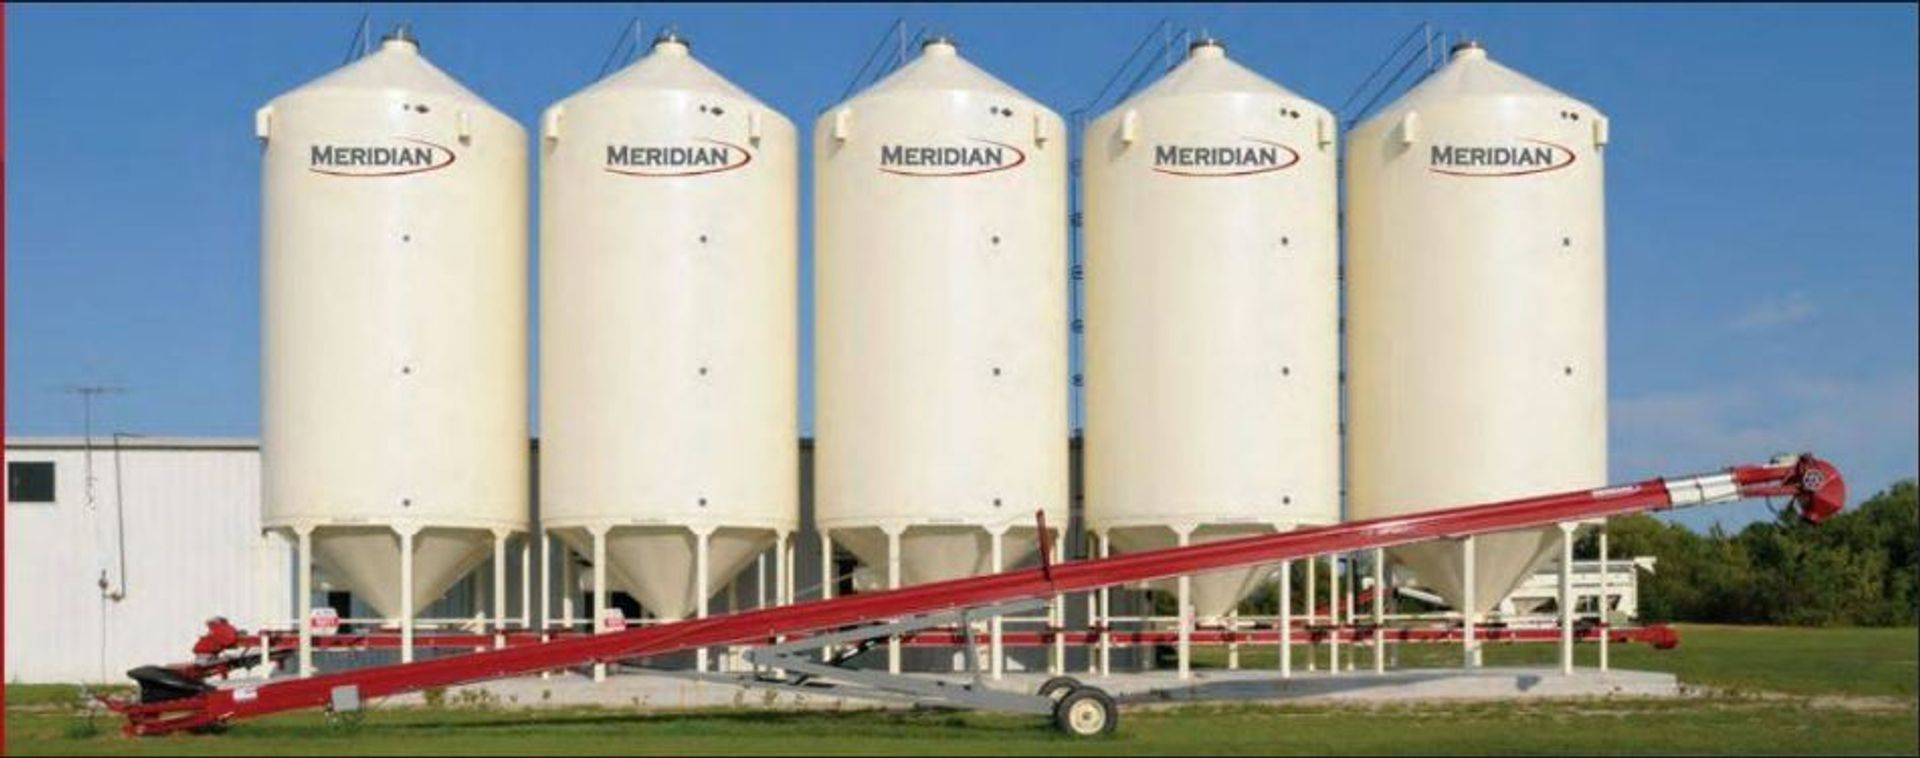 Meridian Holding Bins